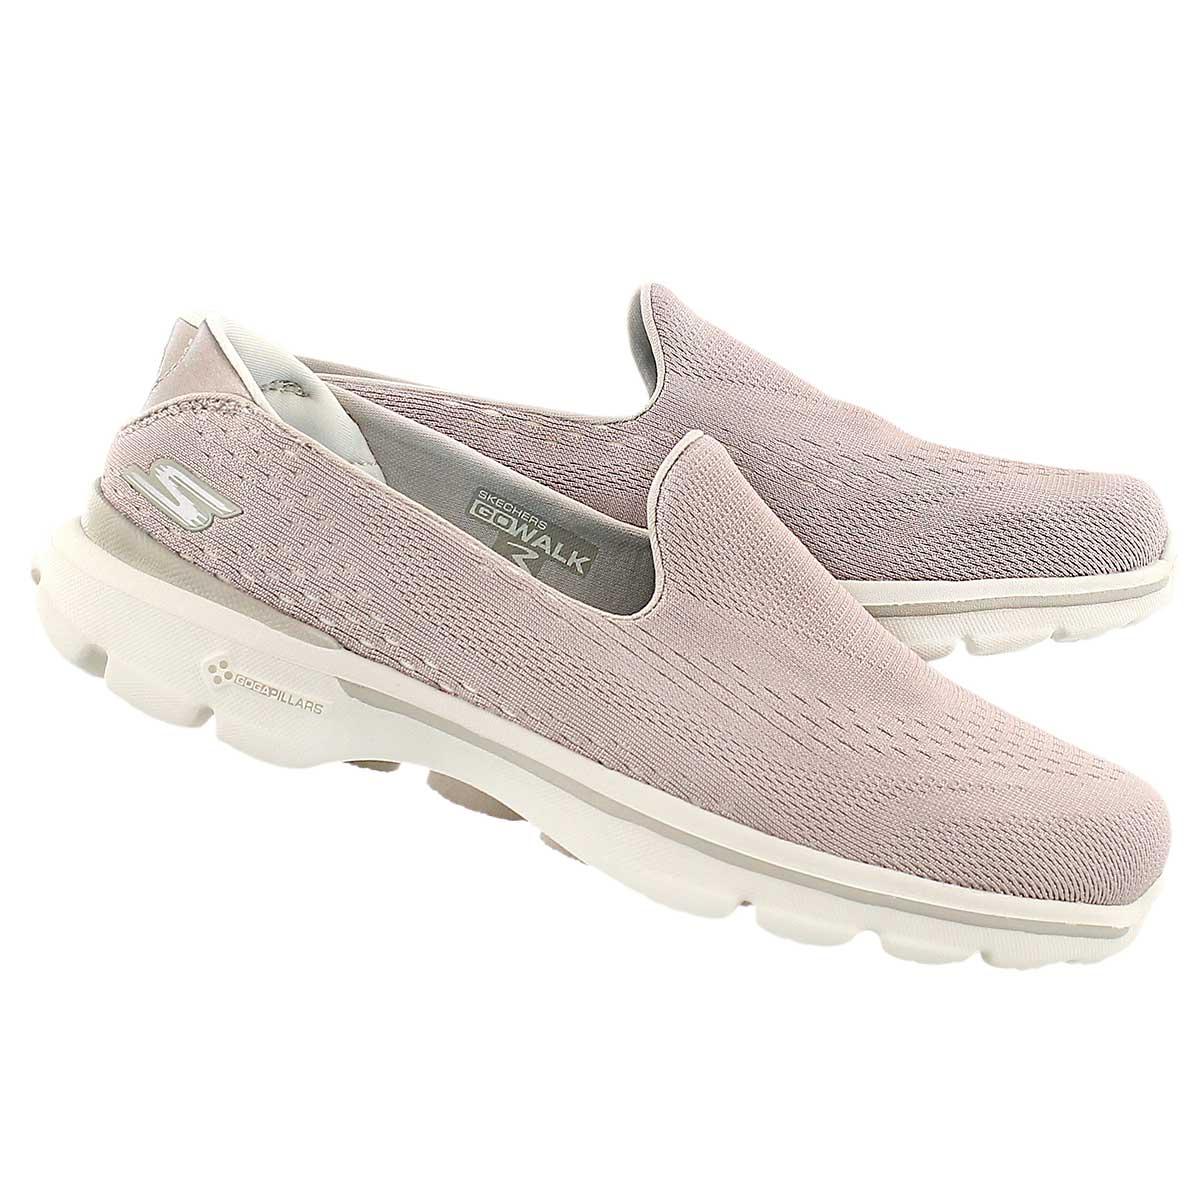 Lds GOwalk 3 natural slipon walking shoe